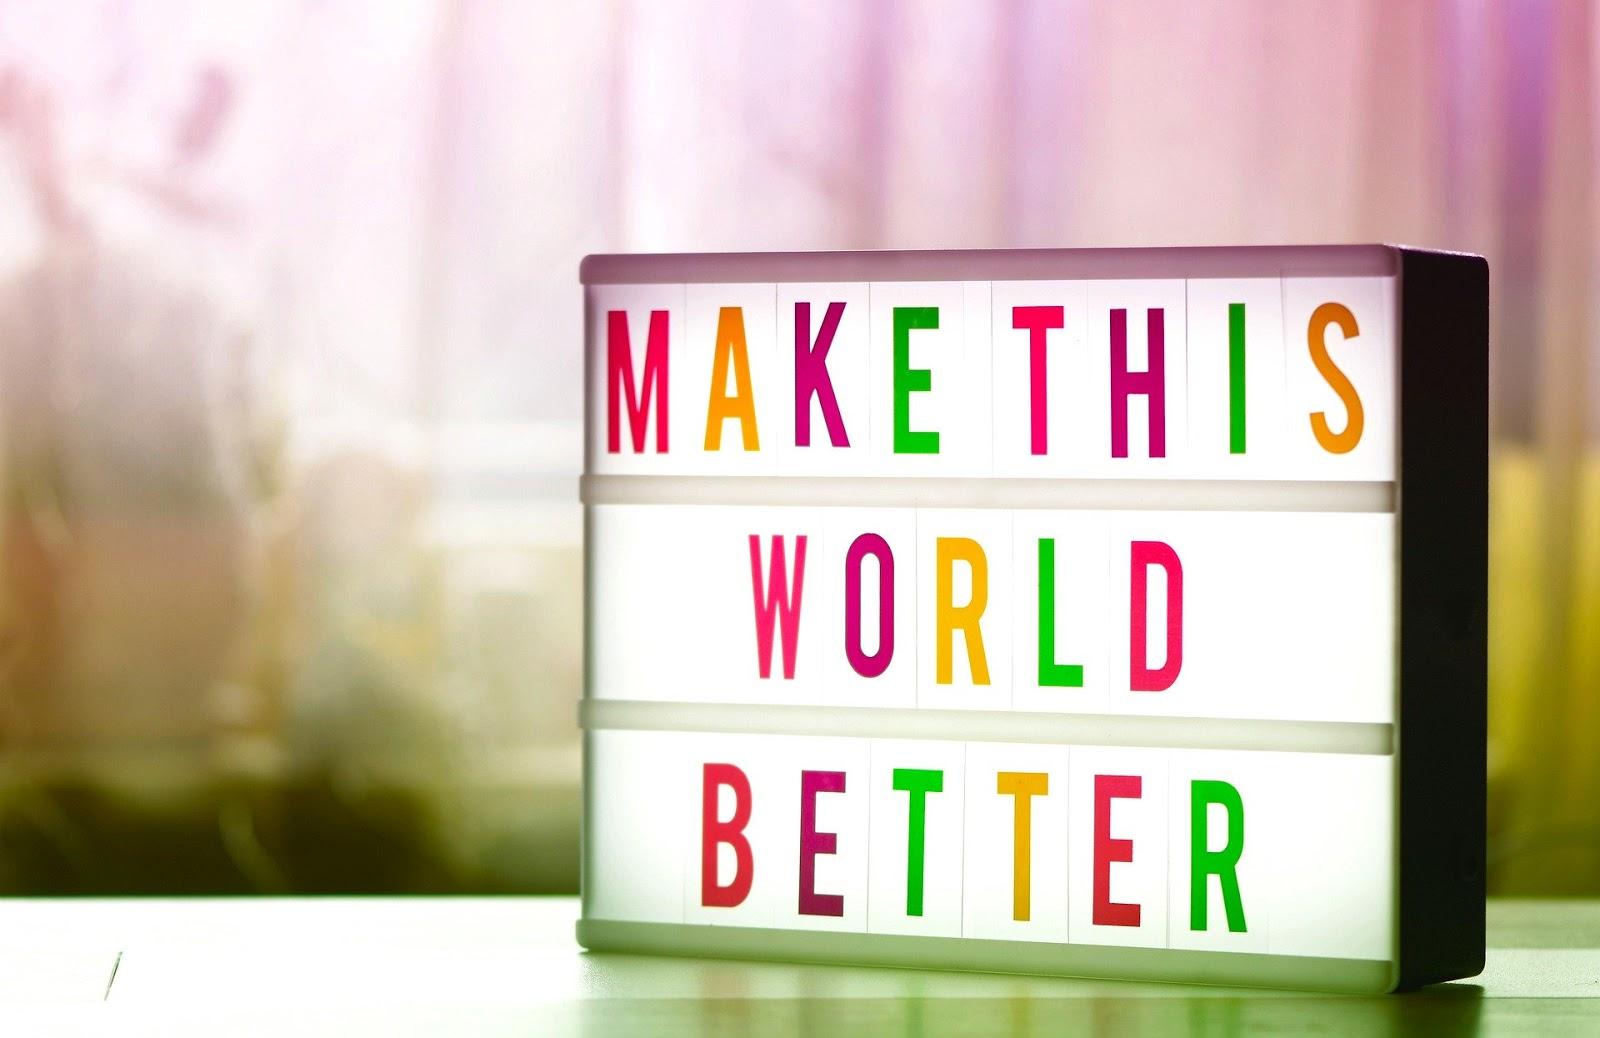 """Make this world better"" sign"